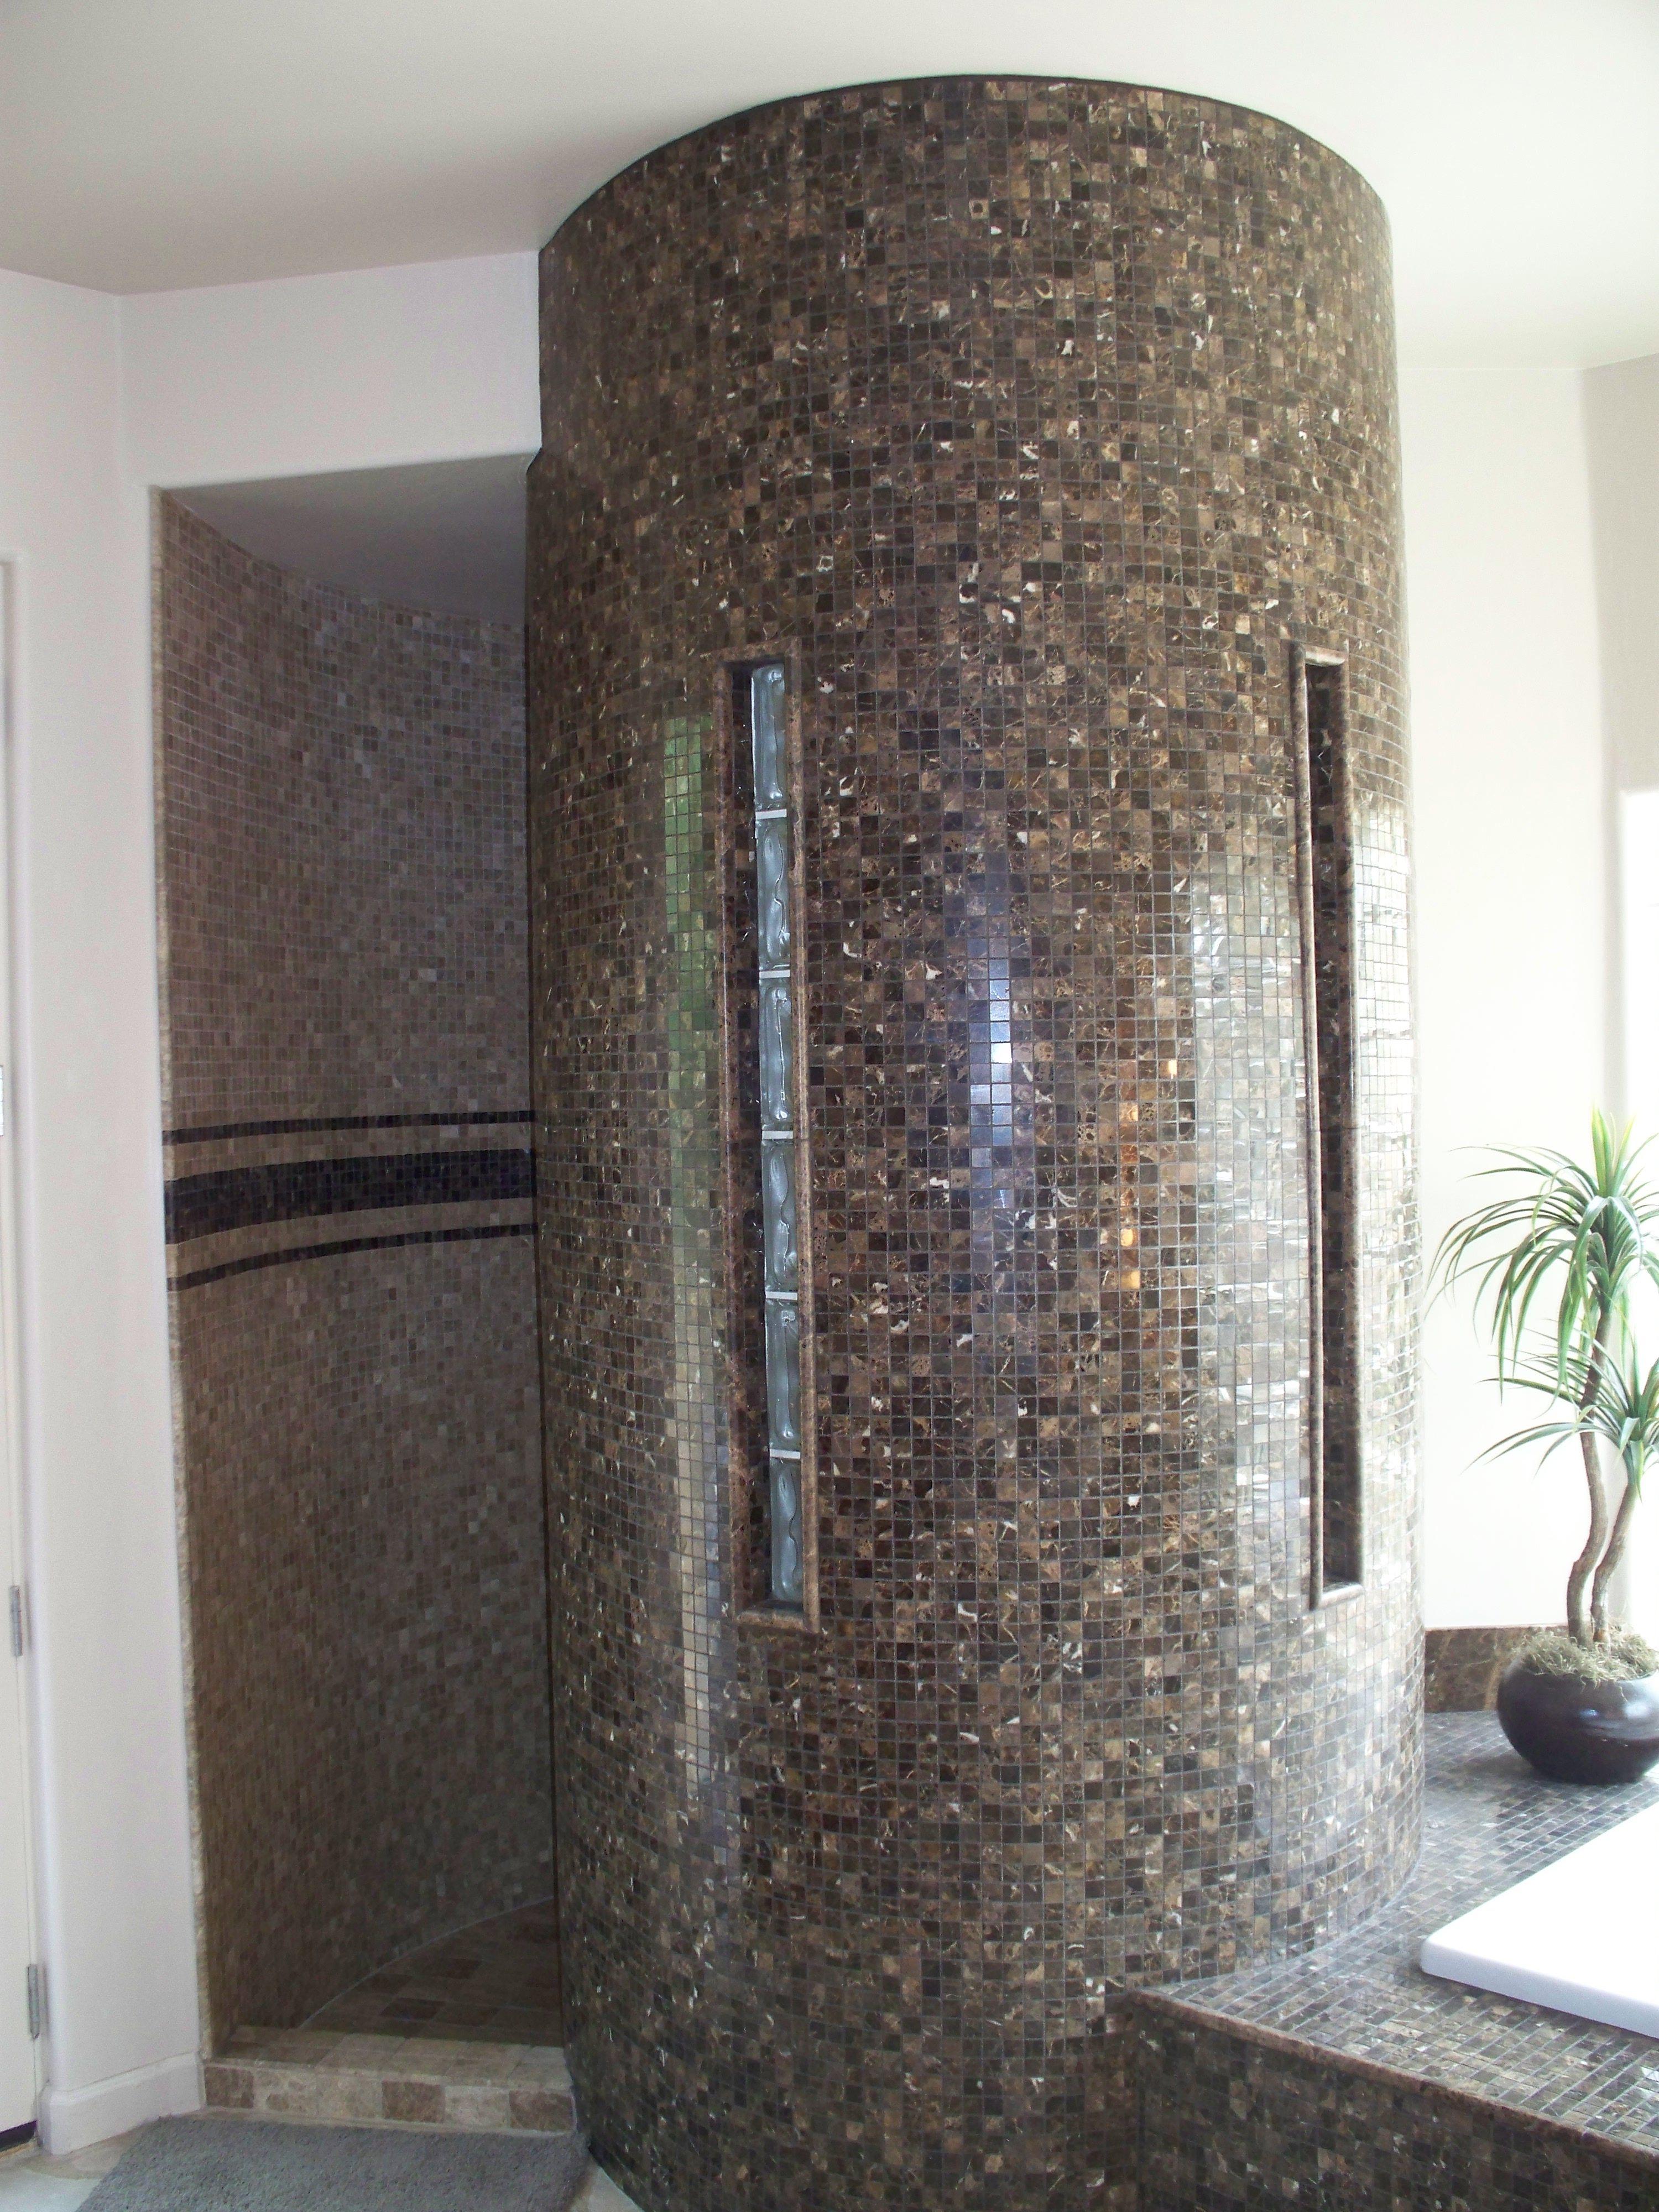 Tile And Glass Block Snail Shower Bathroom Design Ideas